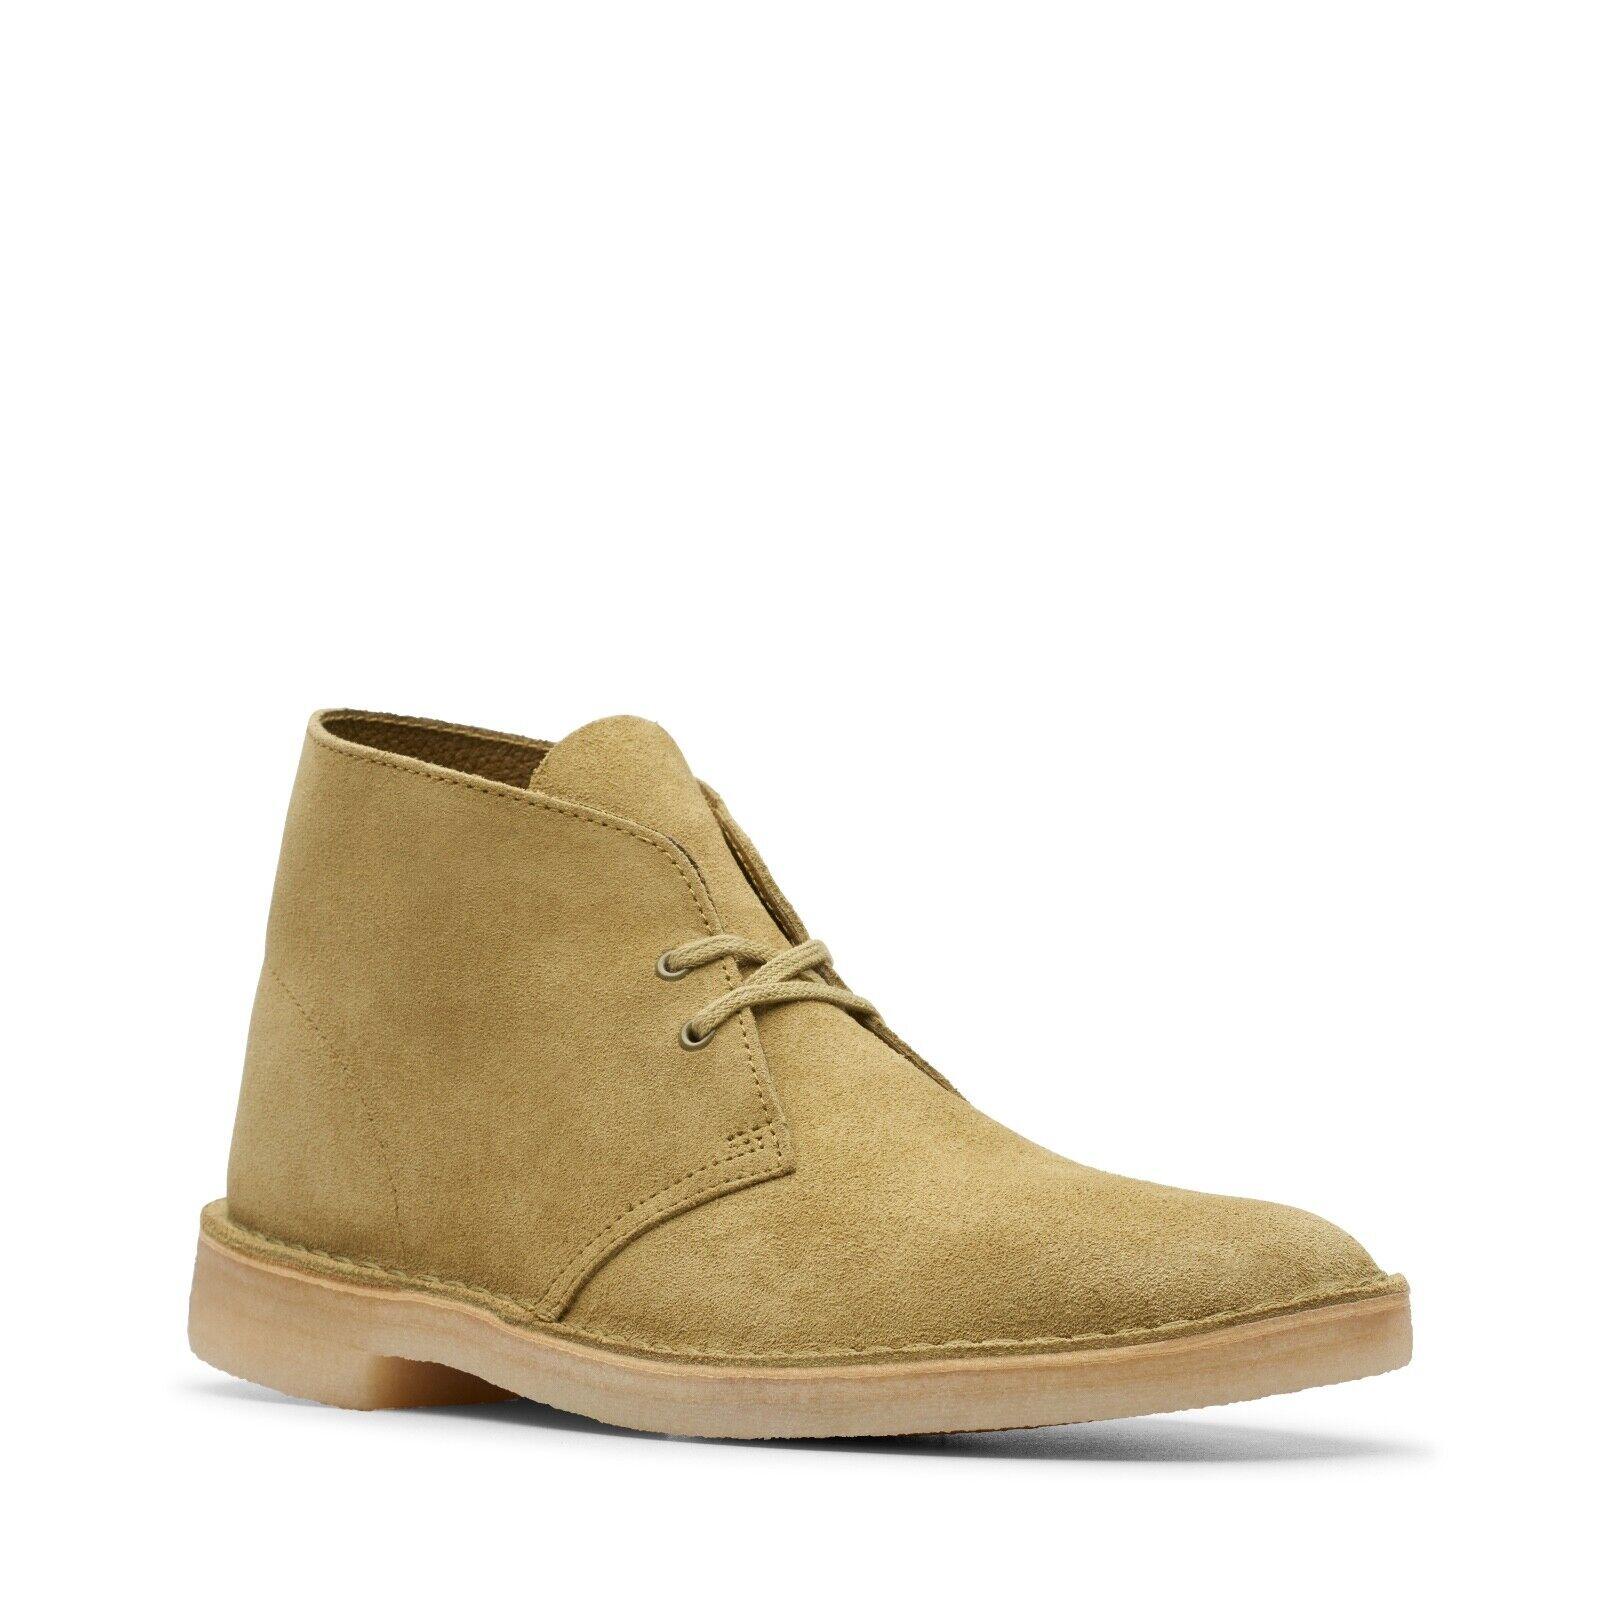 Clarks Originals Men's Desert Boots Khaki Suede 26144162